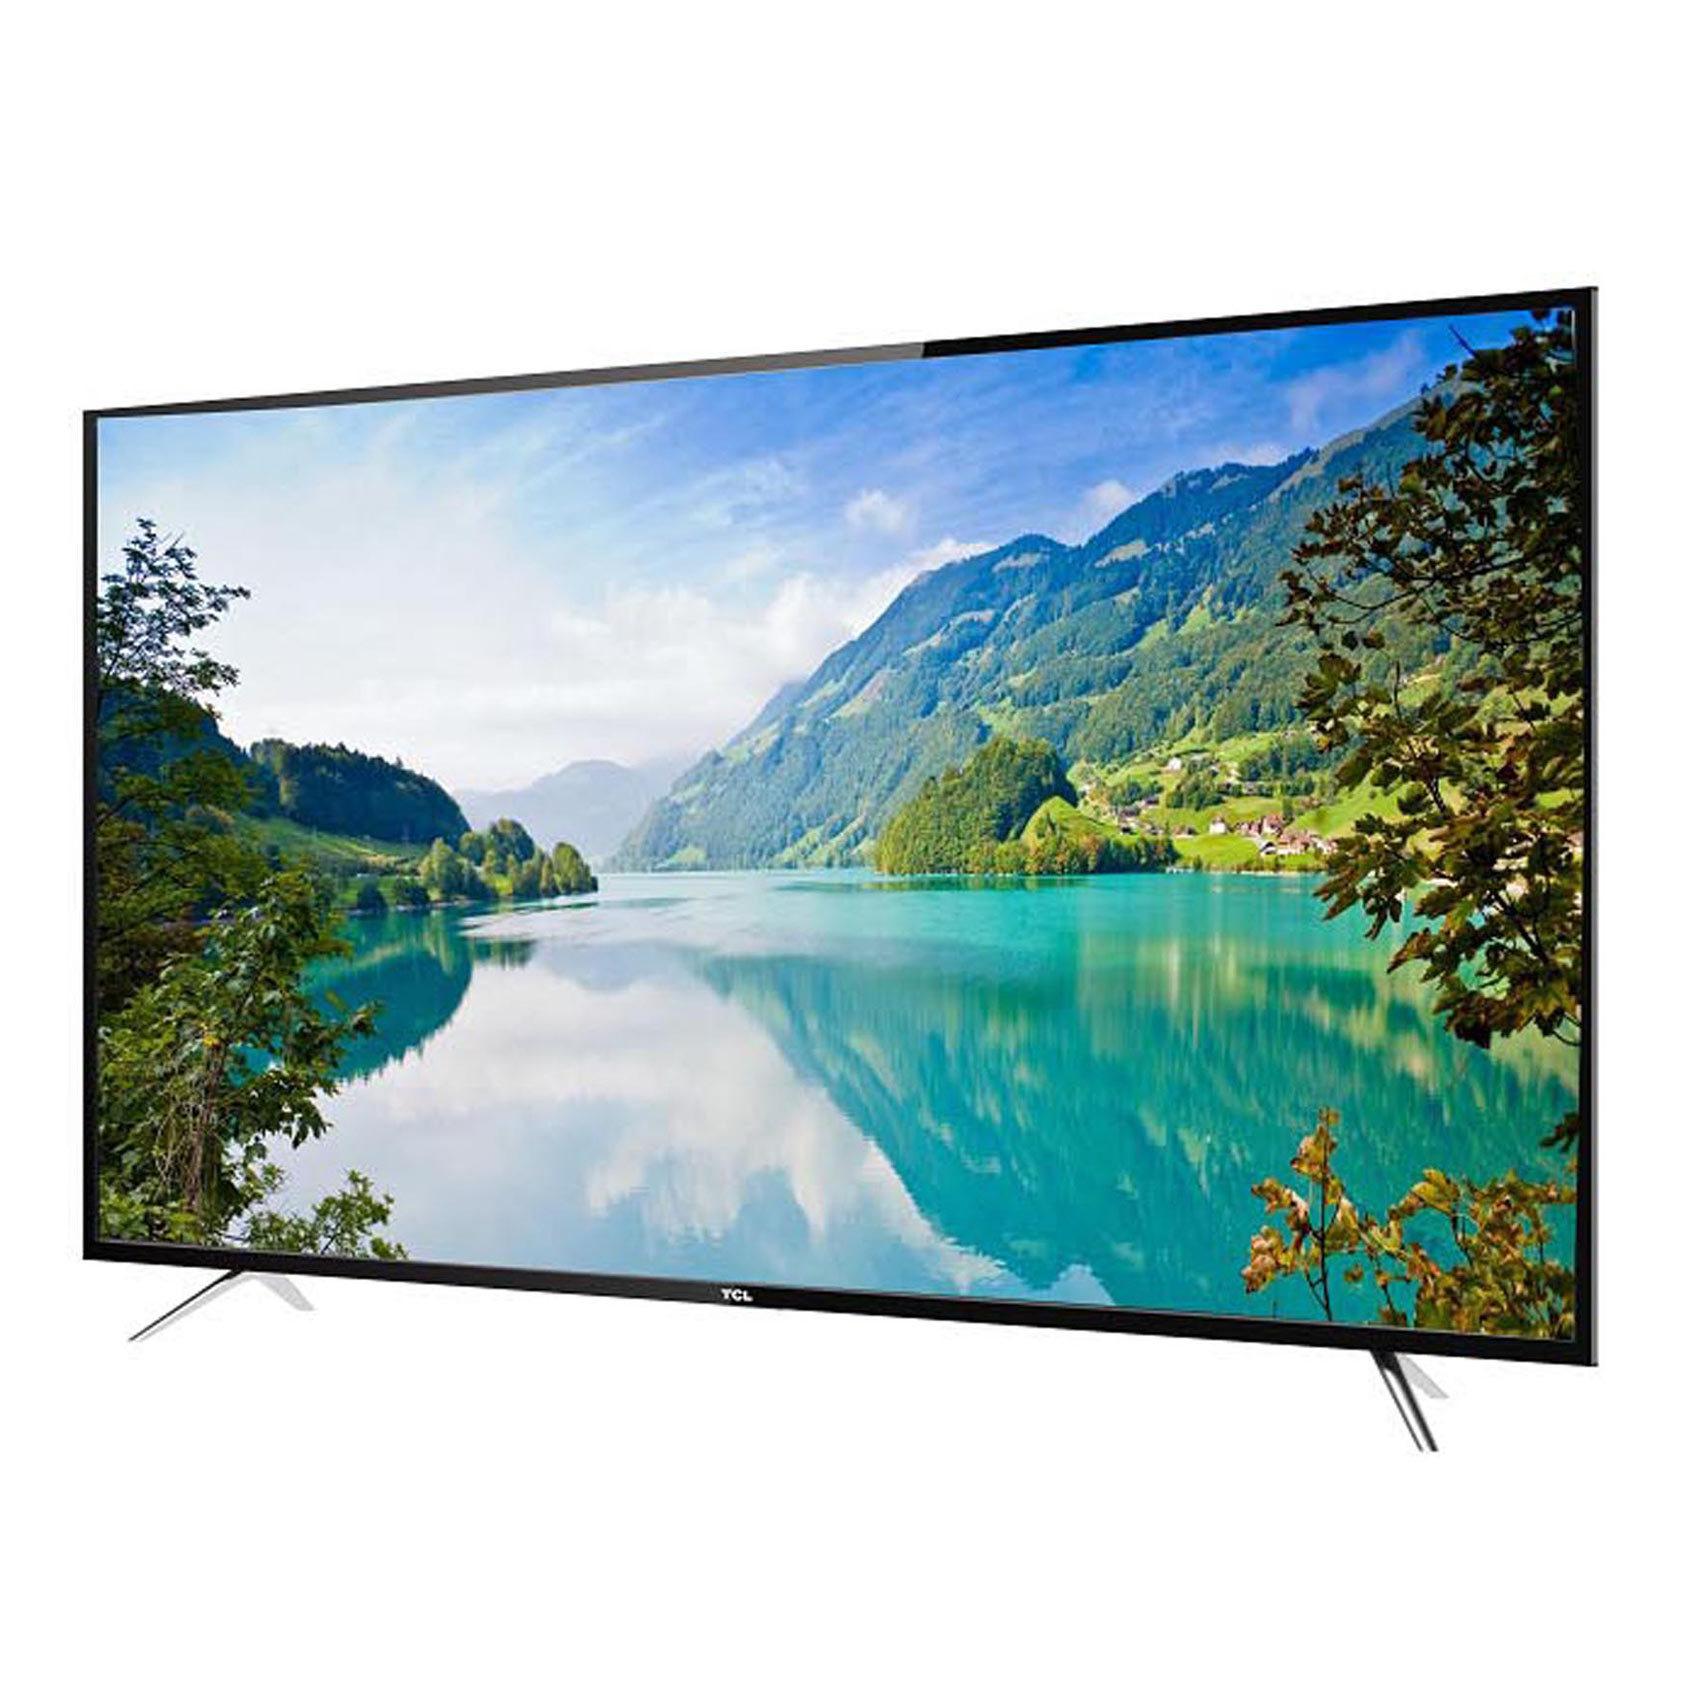 TCL UHD TV 65